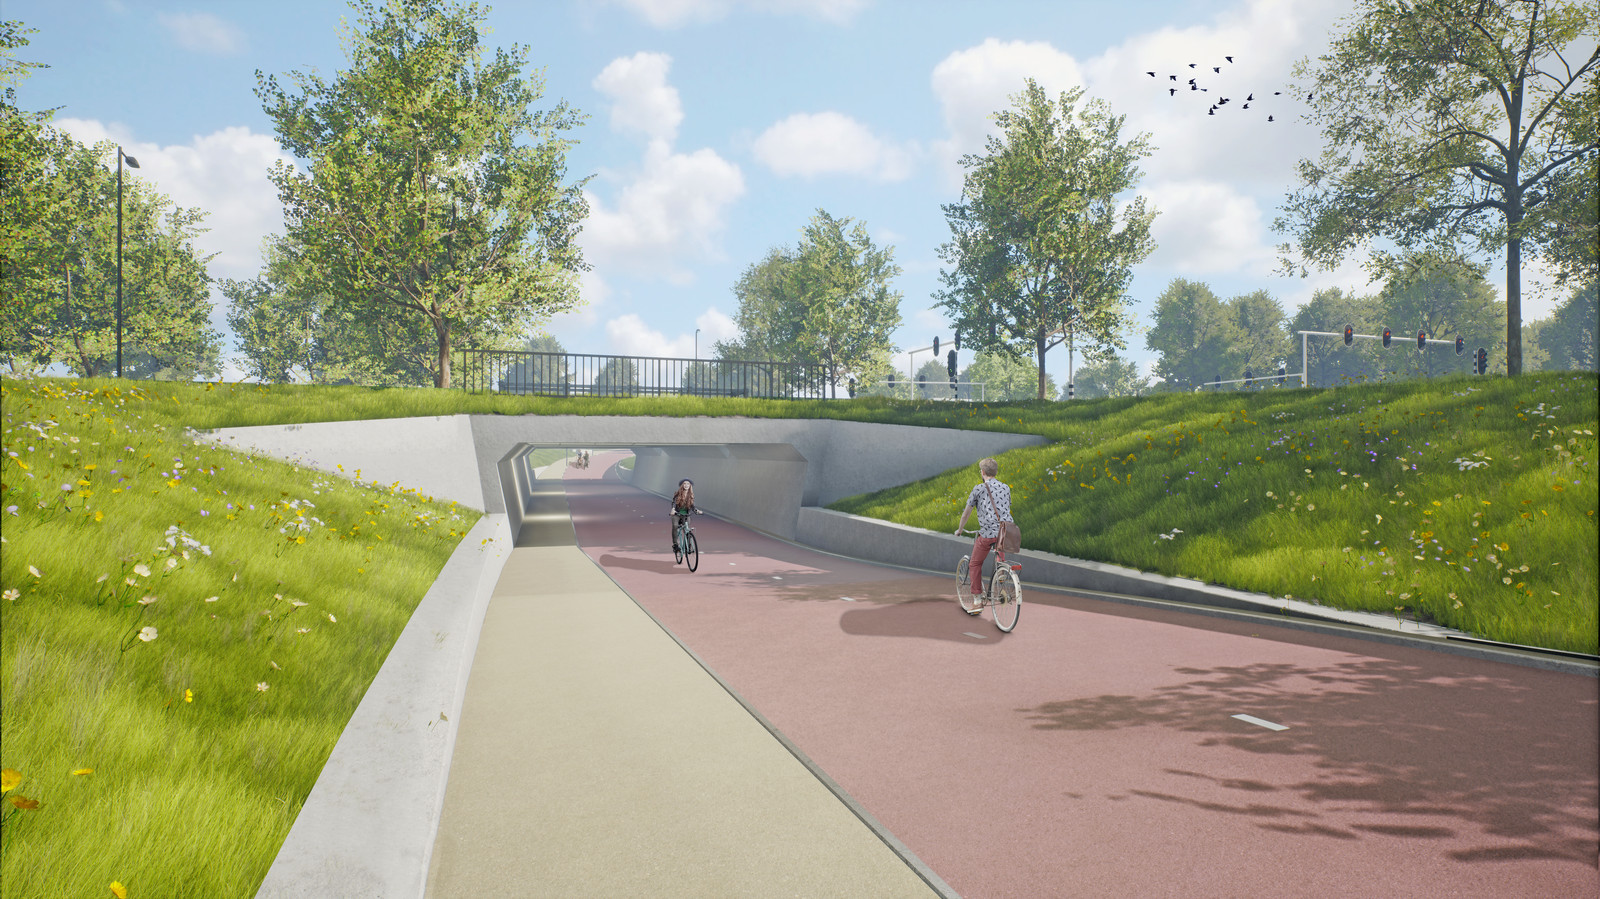 Aanleg fietstunnel Ringbaan Zuid gestart